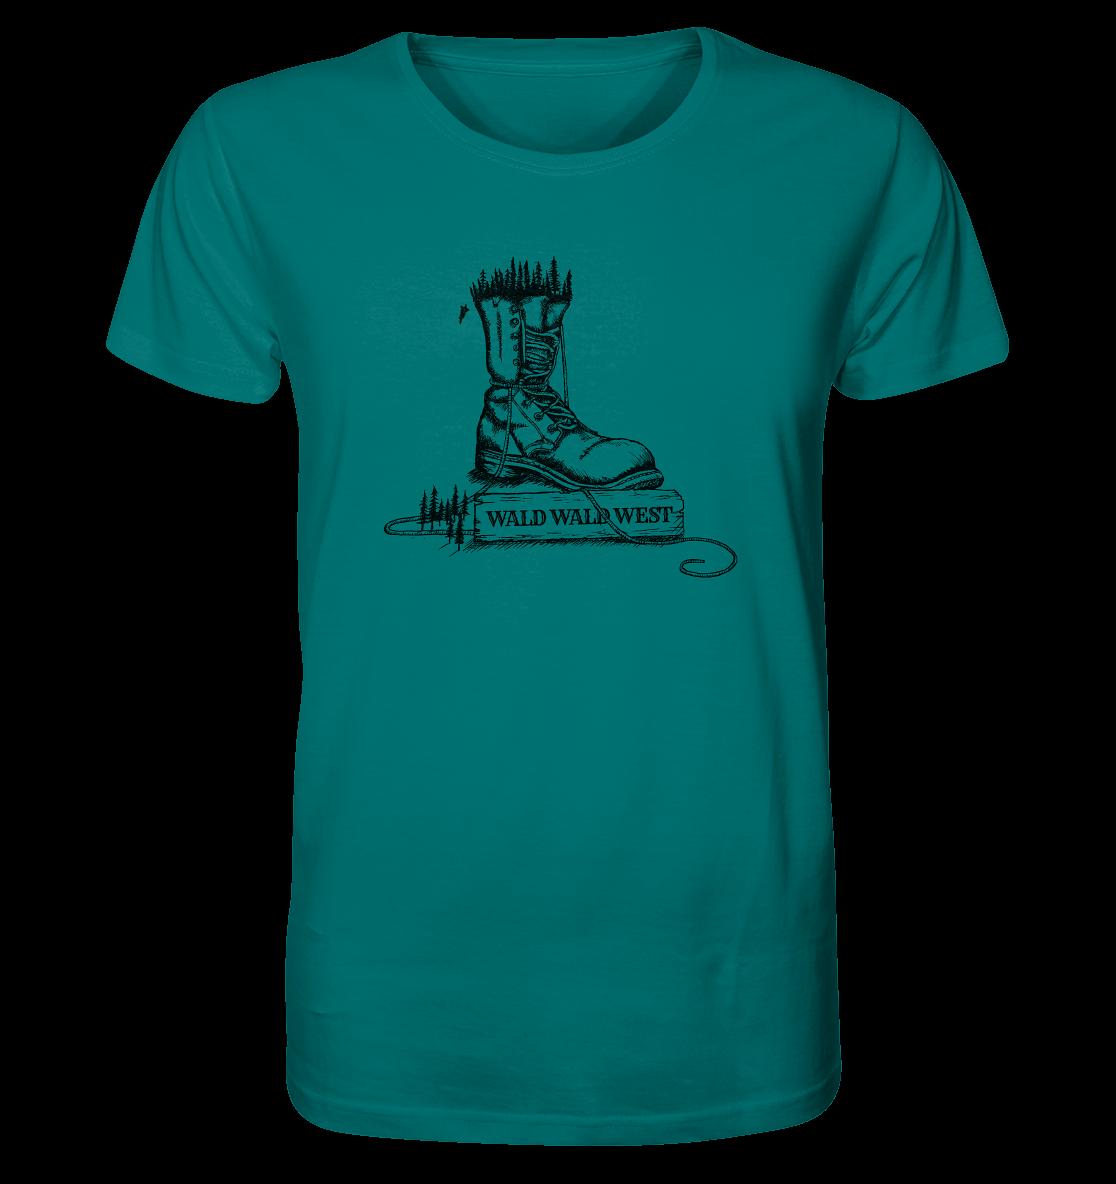 front-organic-shirt-007373-1116x-4.png